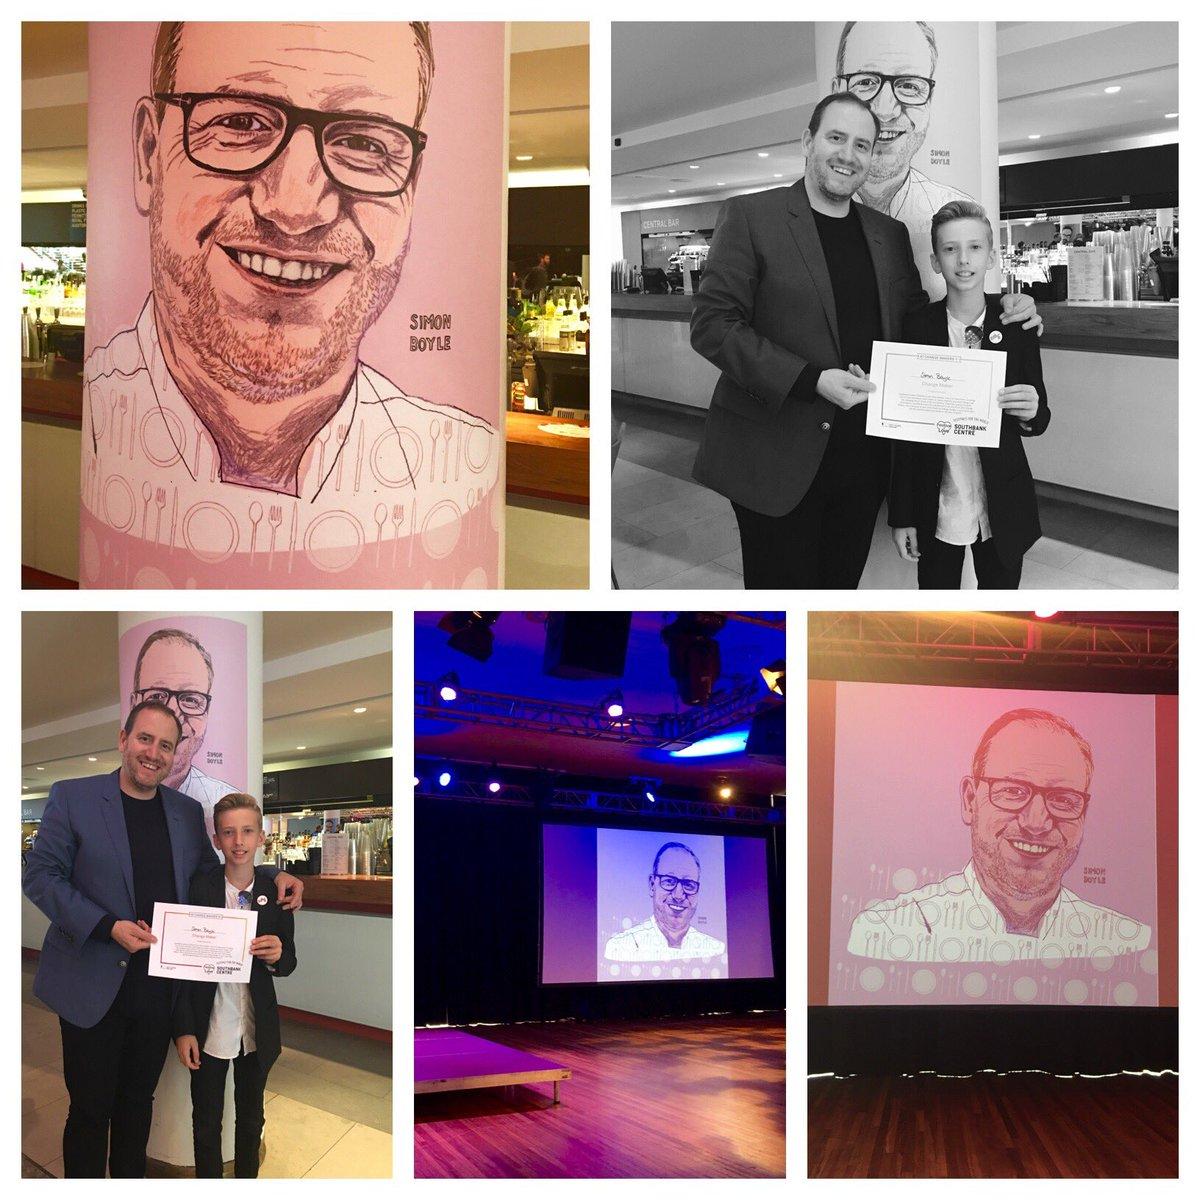 Simon-Boyle-Southbank-Centre-Change-Maker-Award.jpg